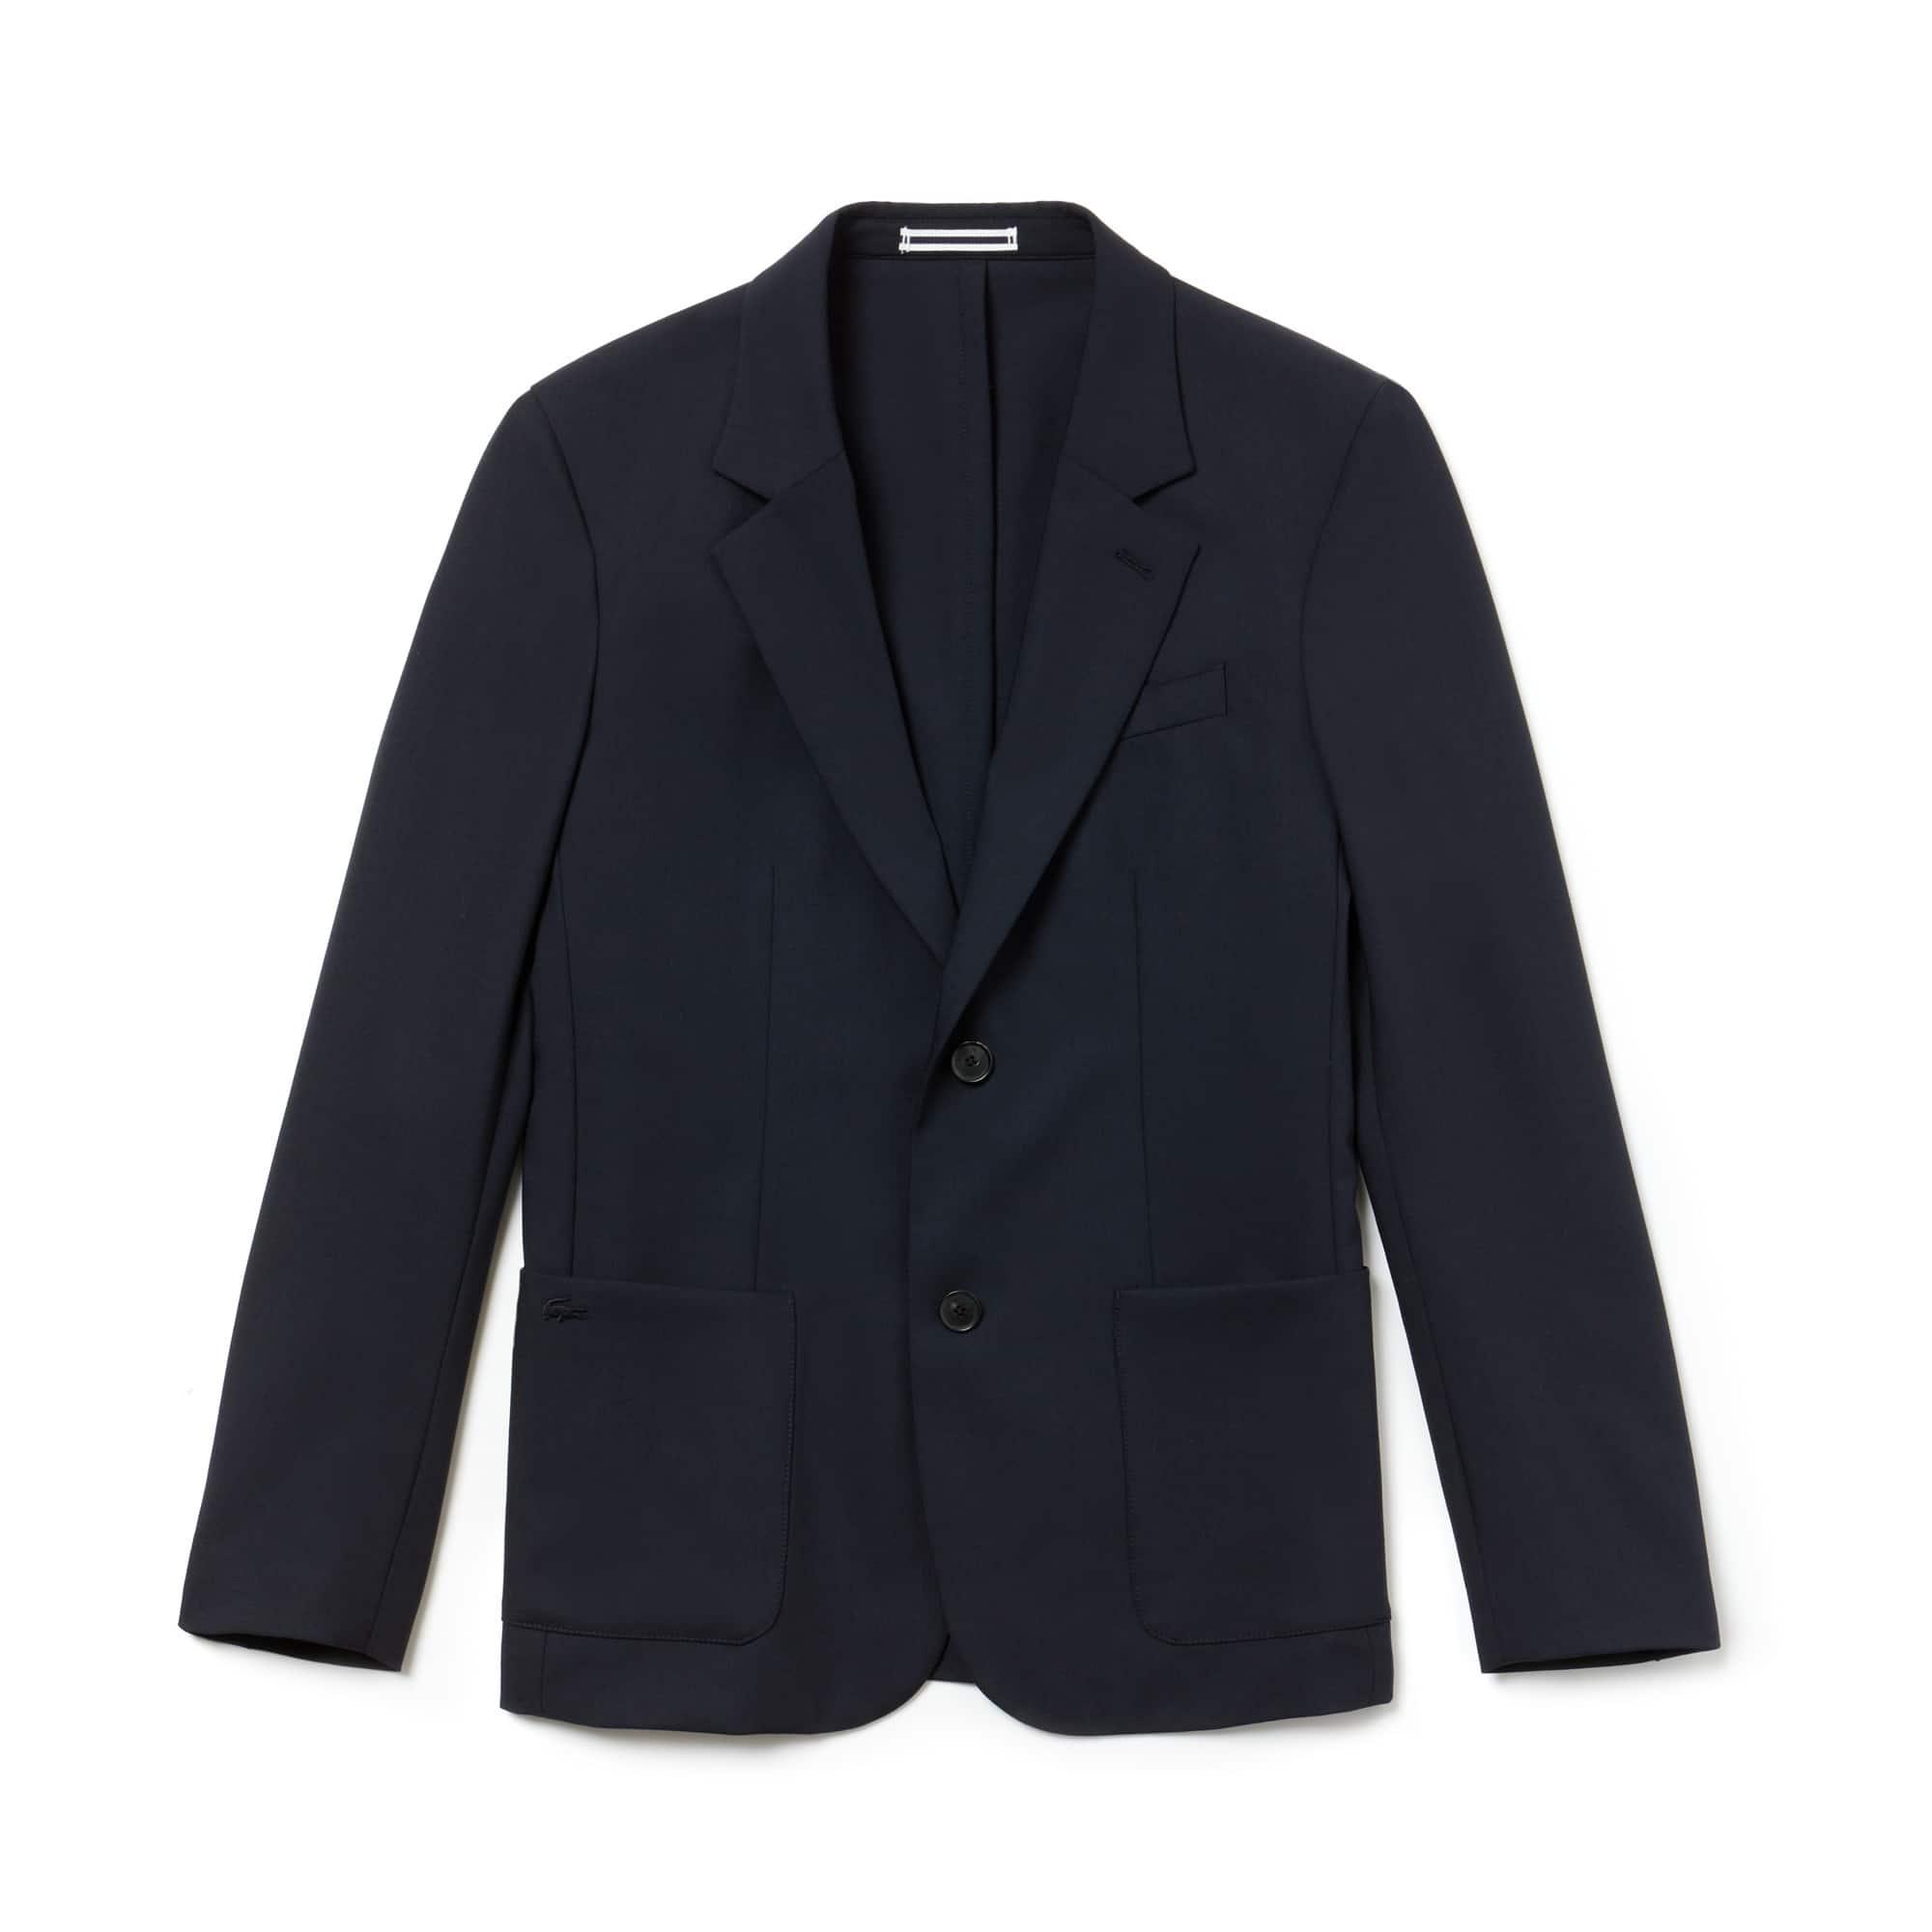 Men's Stretch Wool Twill Blazer